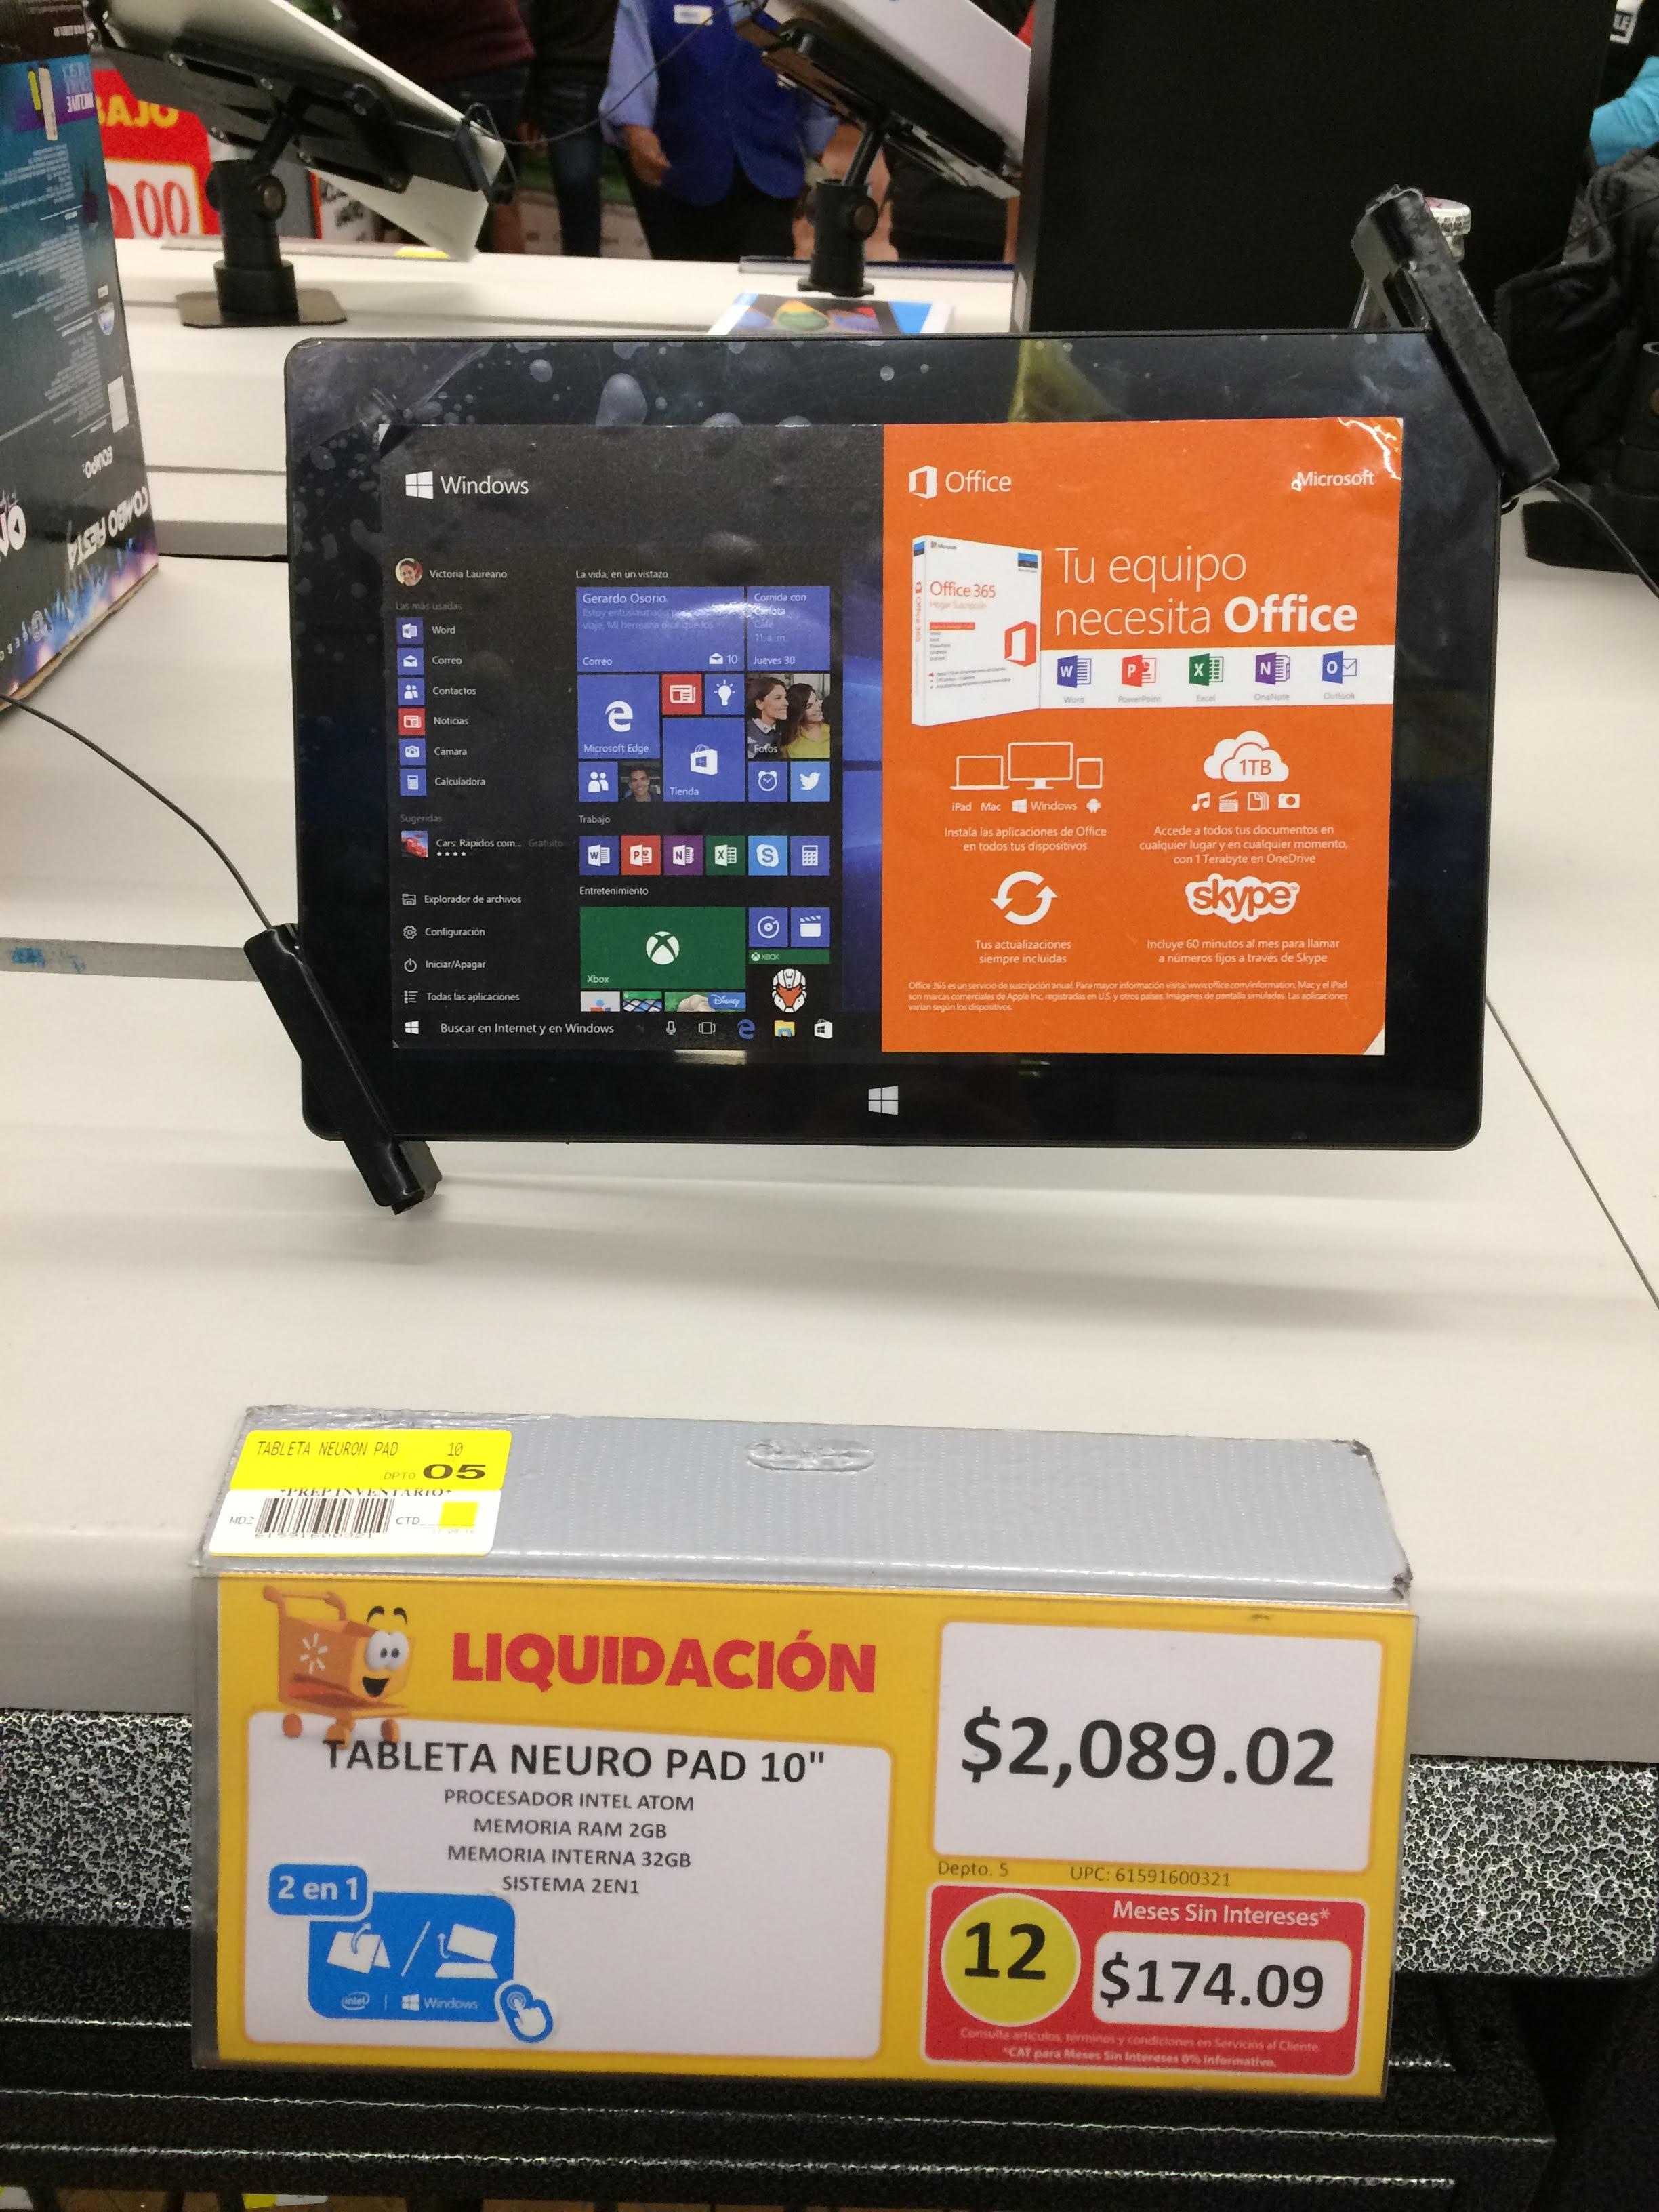 Walmart: Tablet Lanix Neuron PAD a $2,089.02